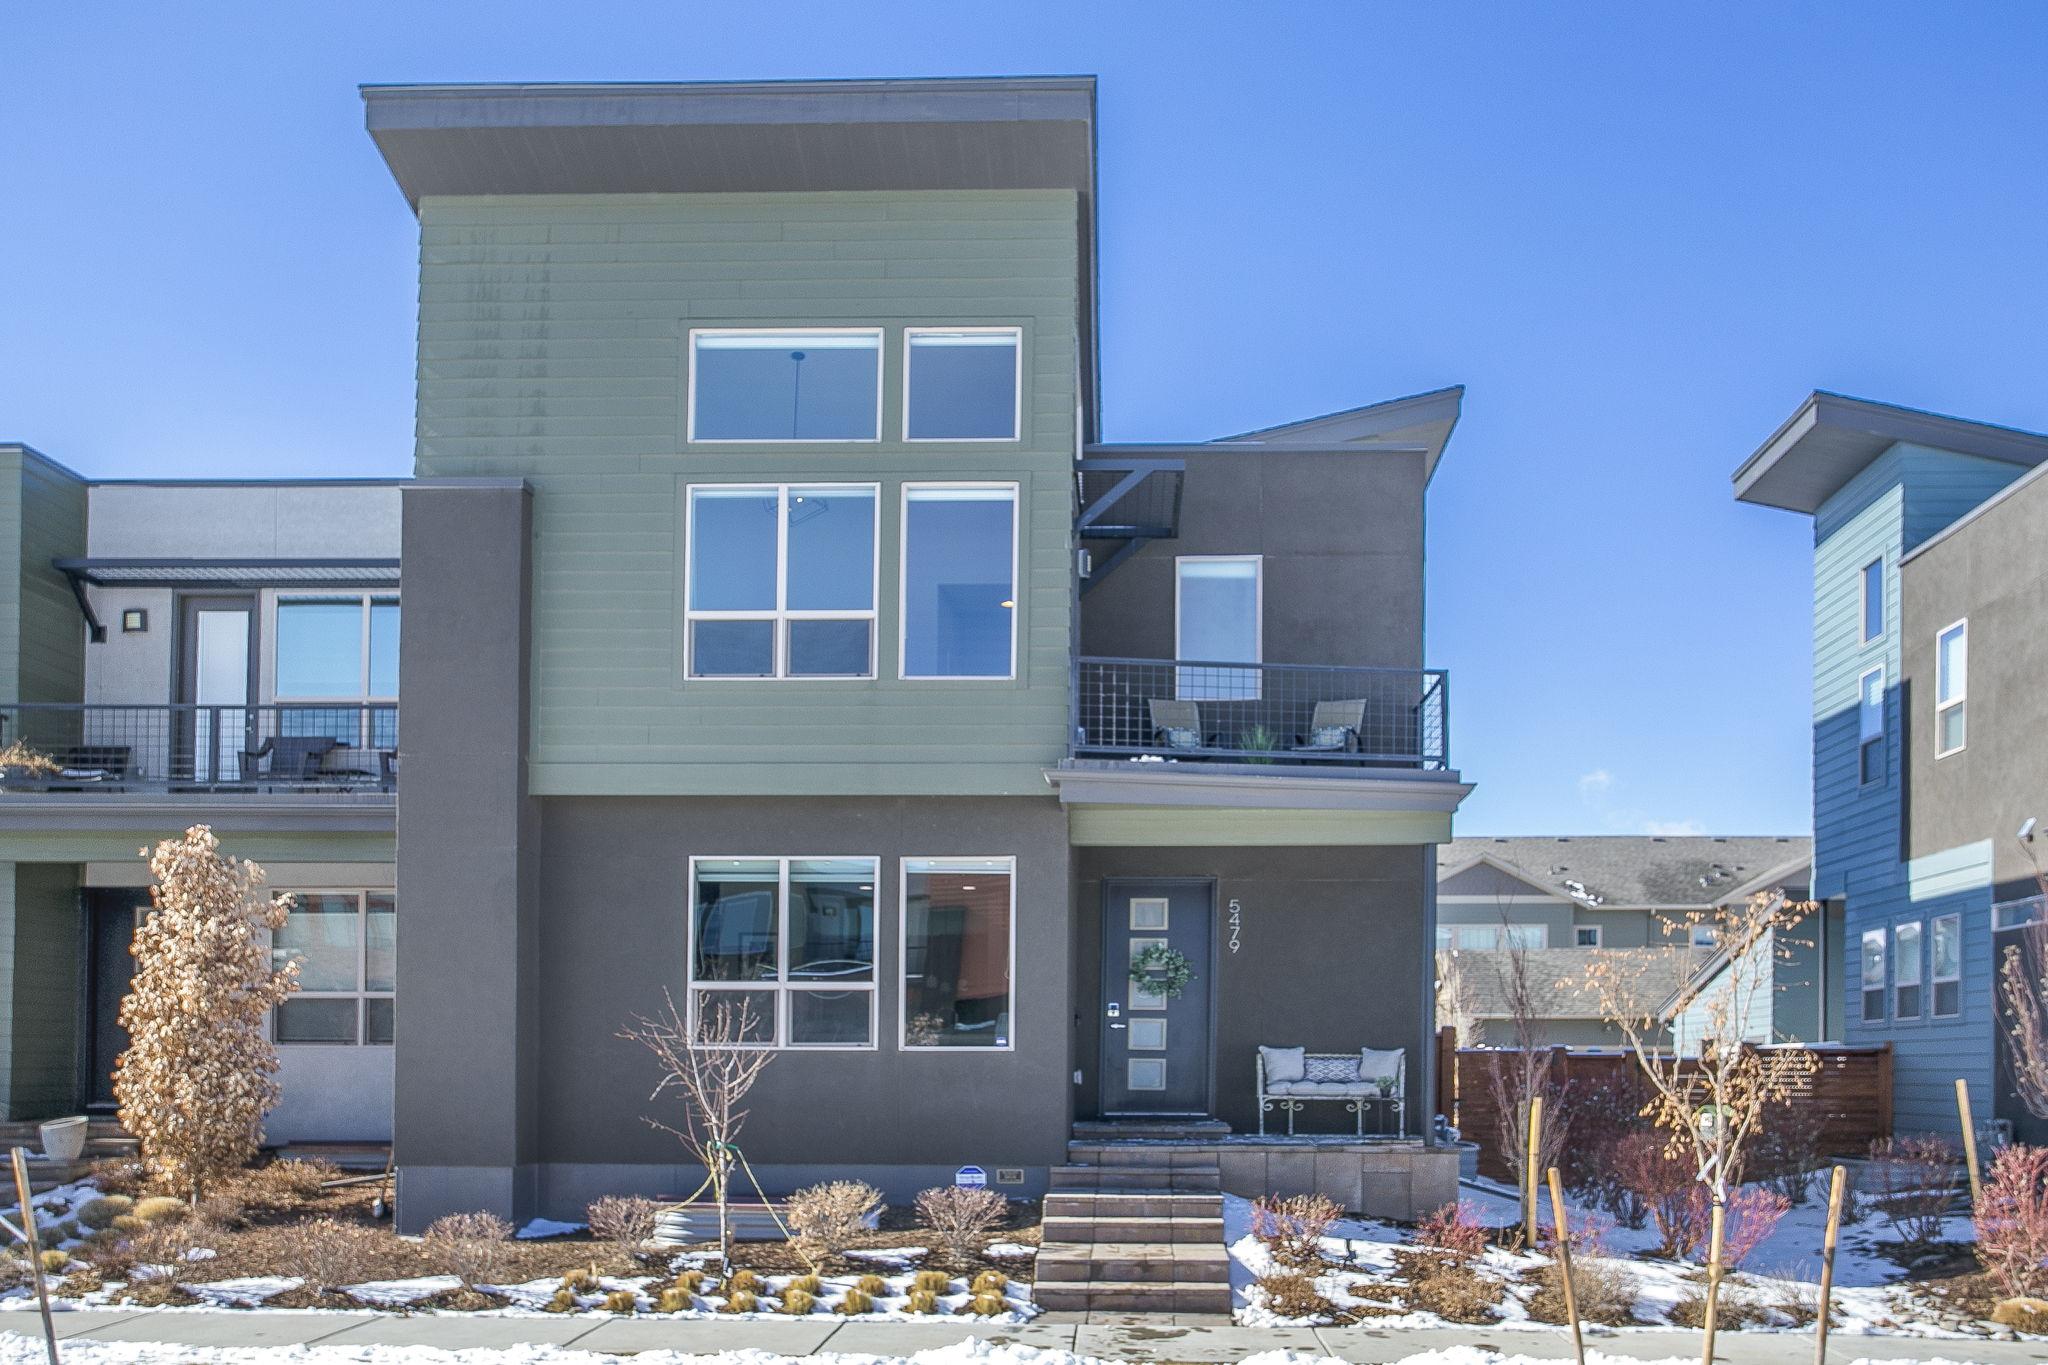 5479 Valentia St, Denver, CO 80238, US